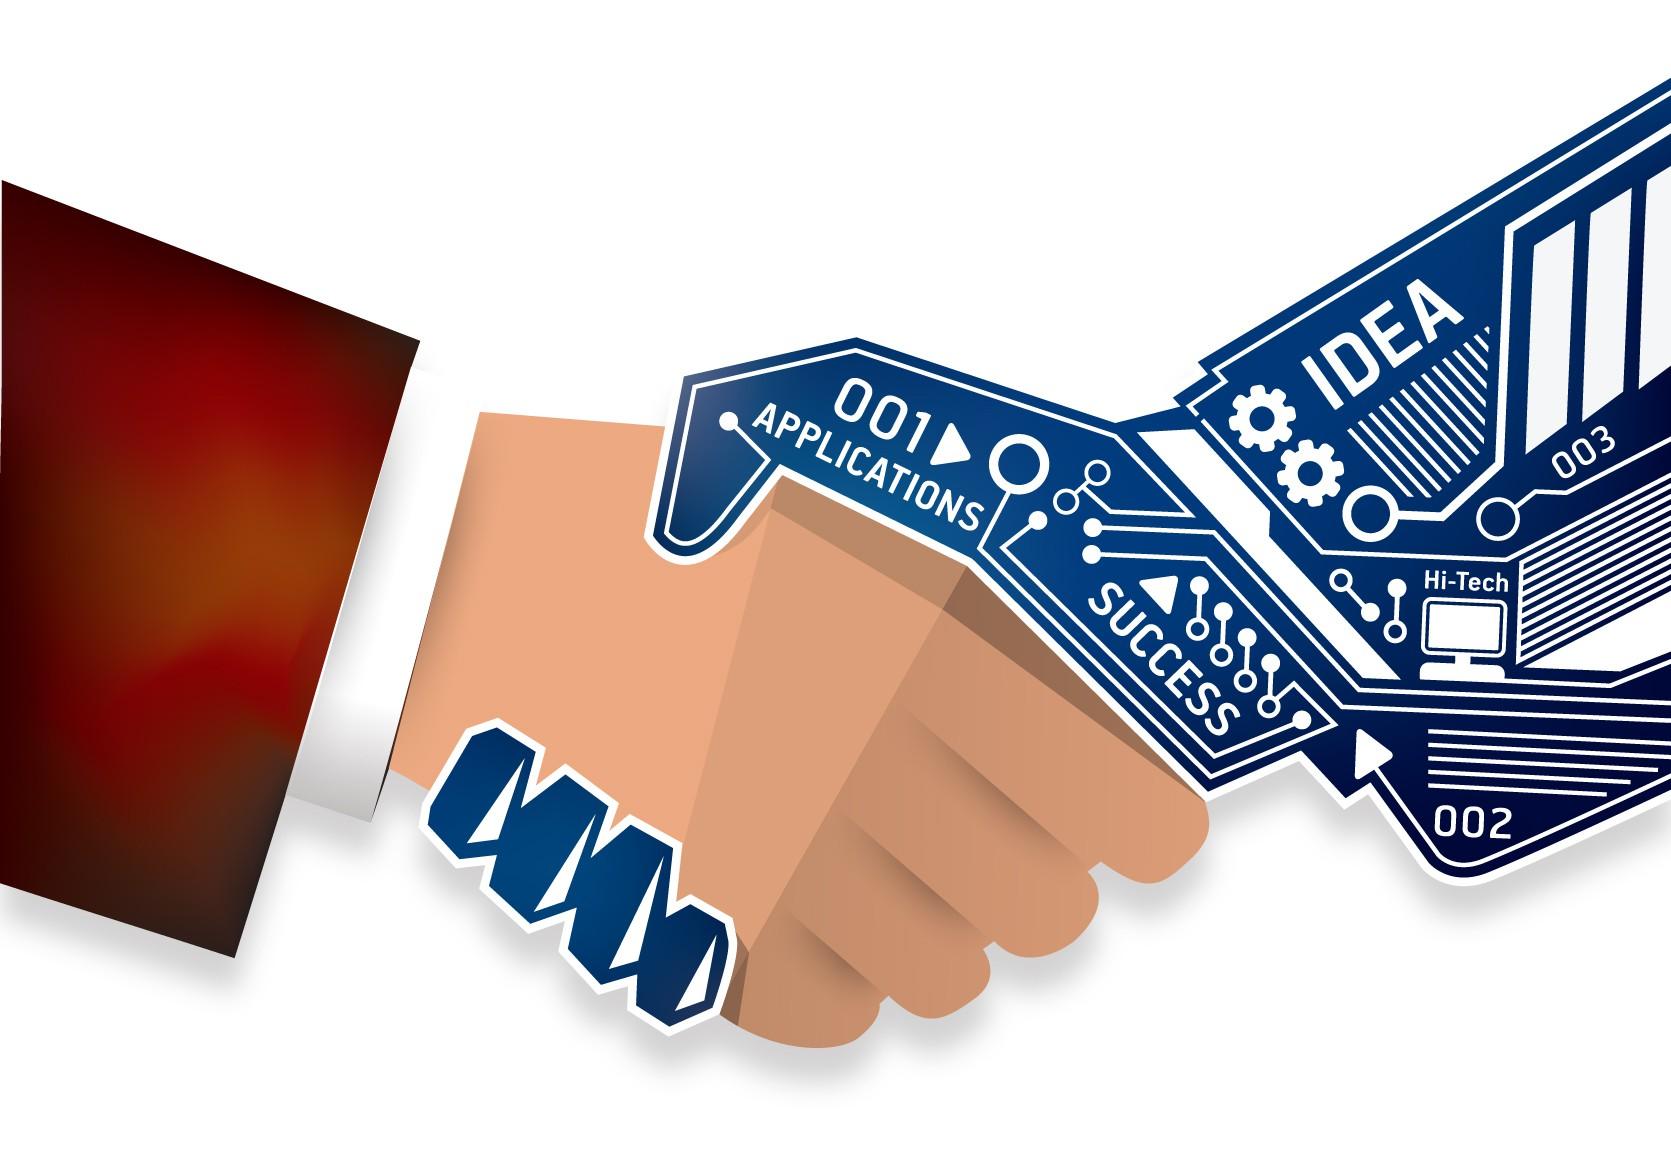 Create a Hi-Tech Handshake front-cover illustration